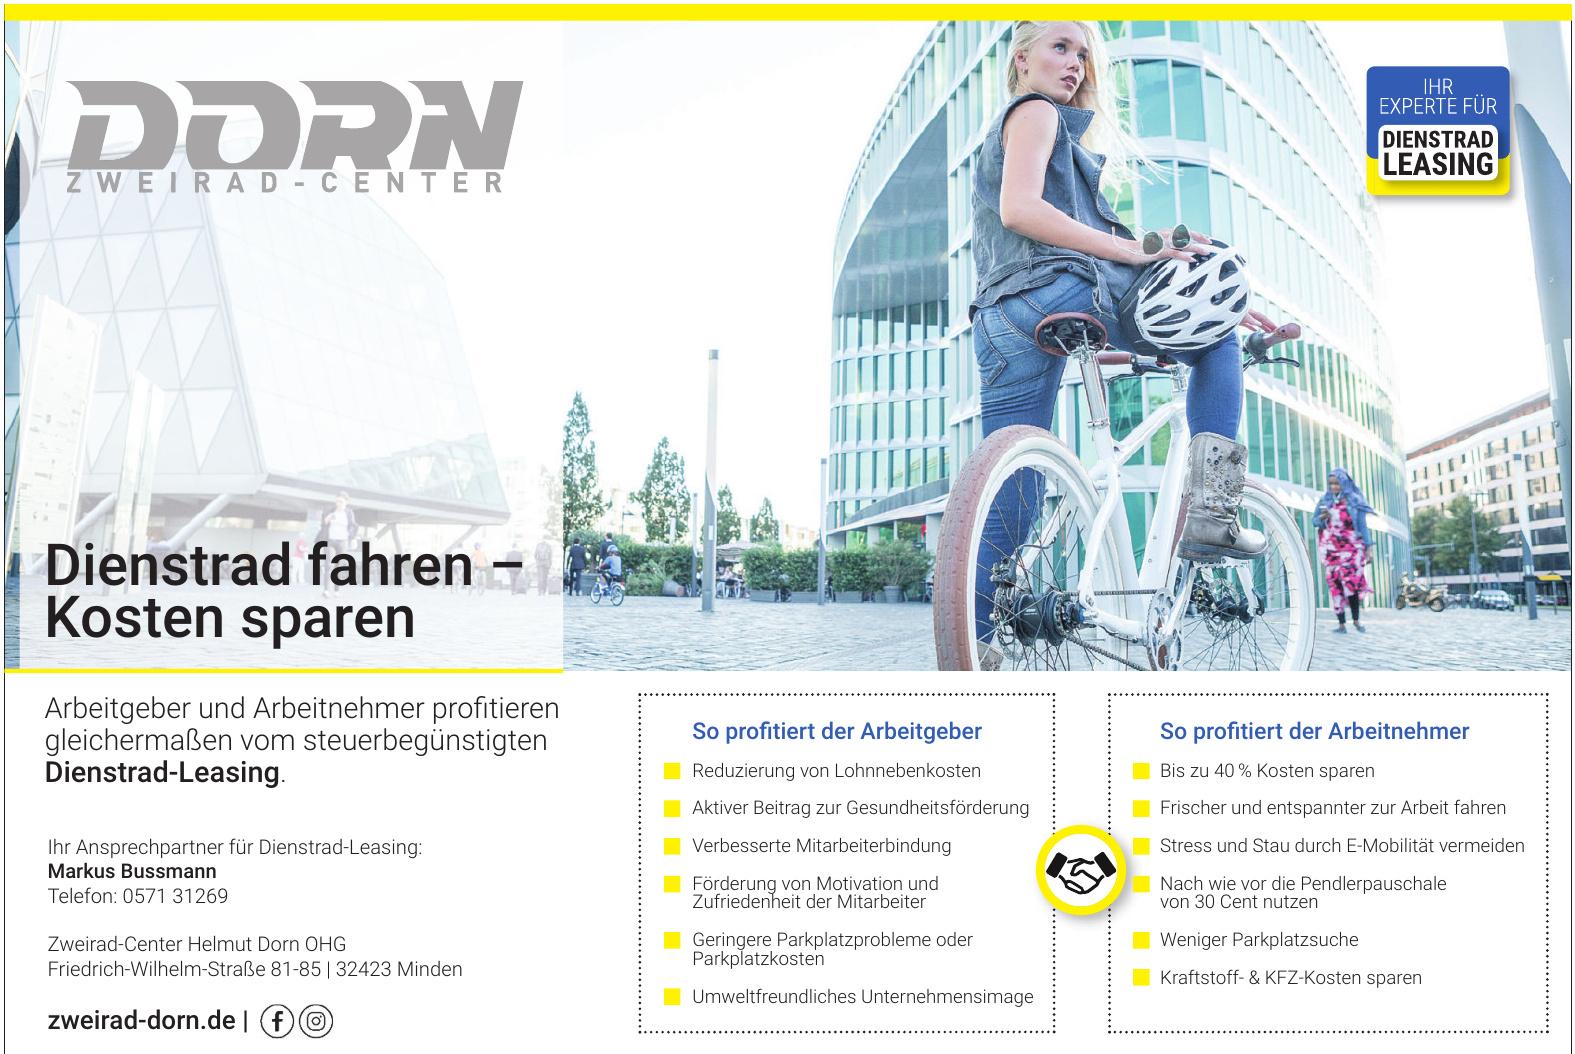 Zweirad-Center Helmut Dorn OHG